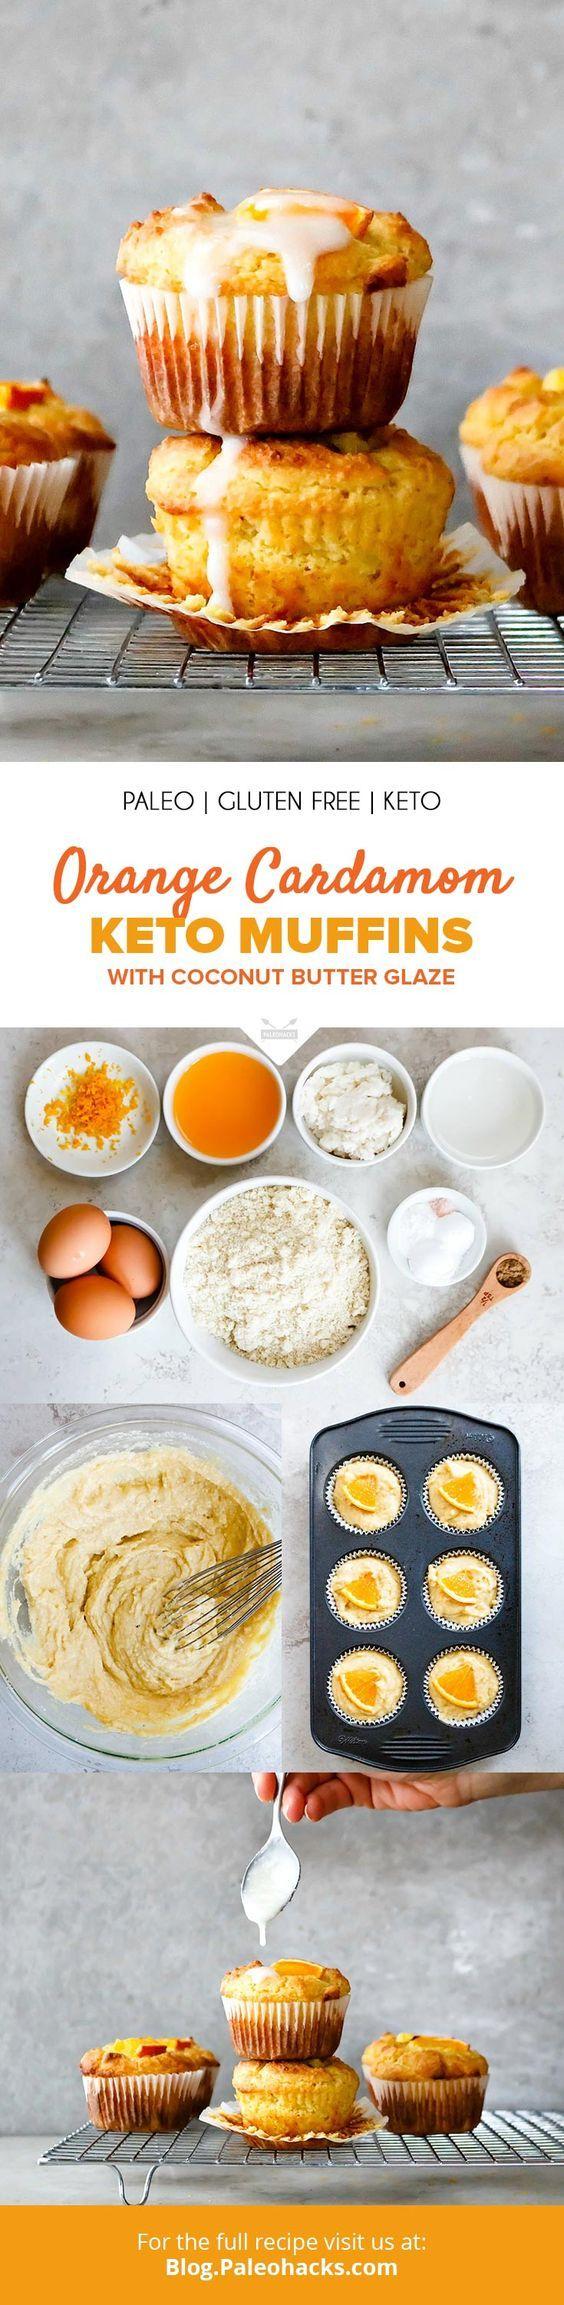 Orange Cardamom Keto Muffins Recipe Recipe Keto Muffin Recipe Paleohacks Recipes Low Carb Desserts